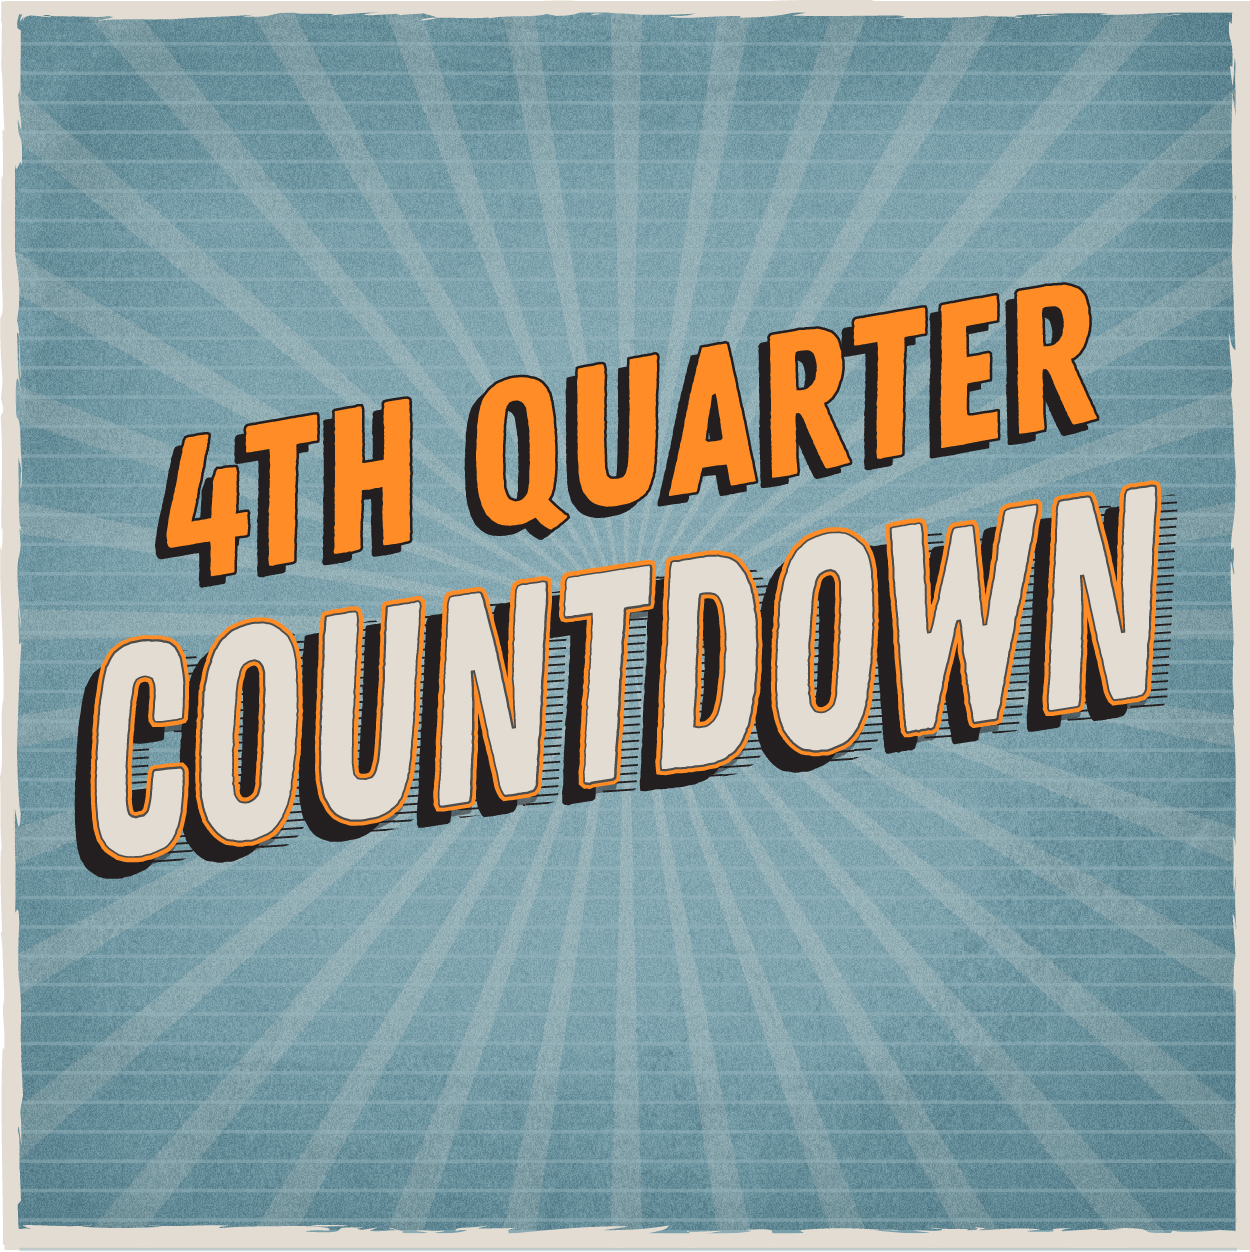 4th Quarter Countdown